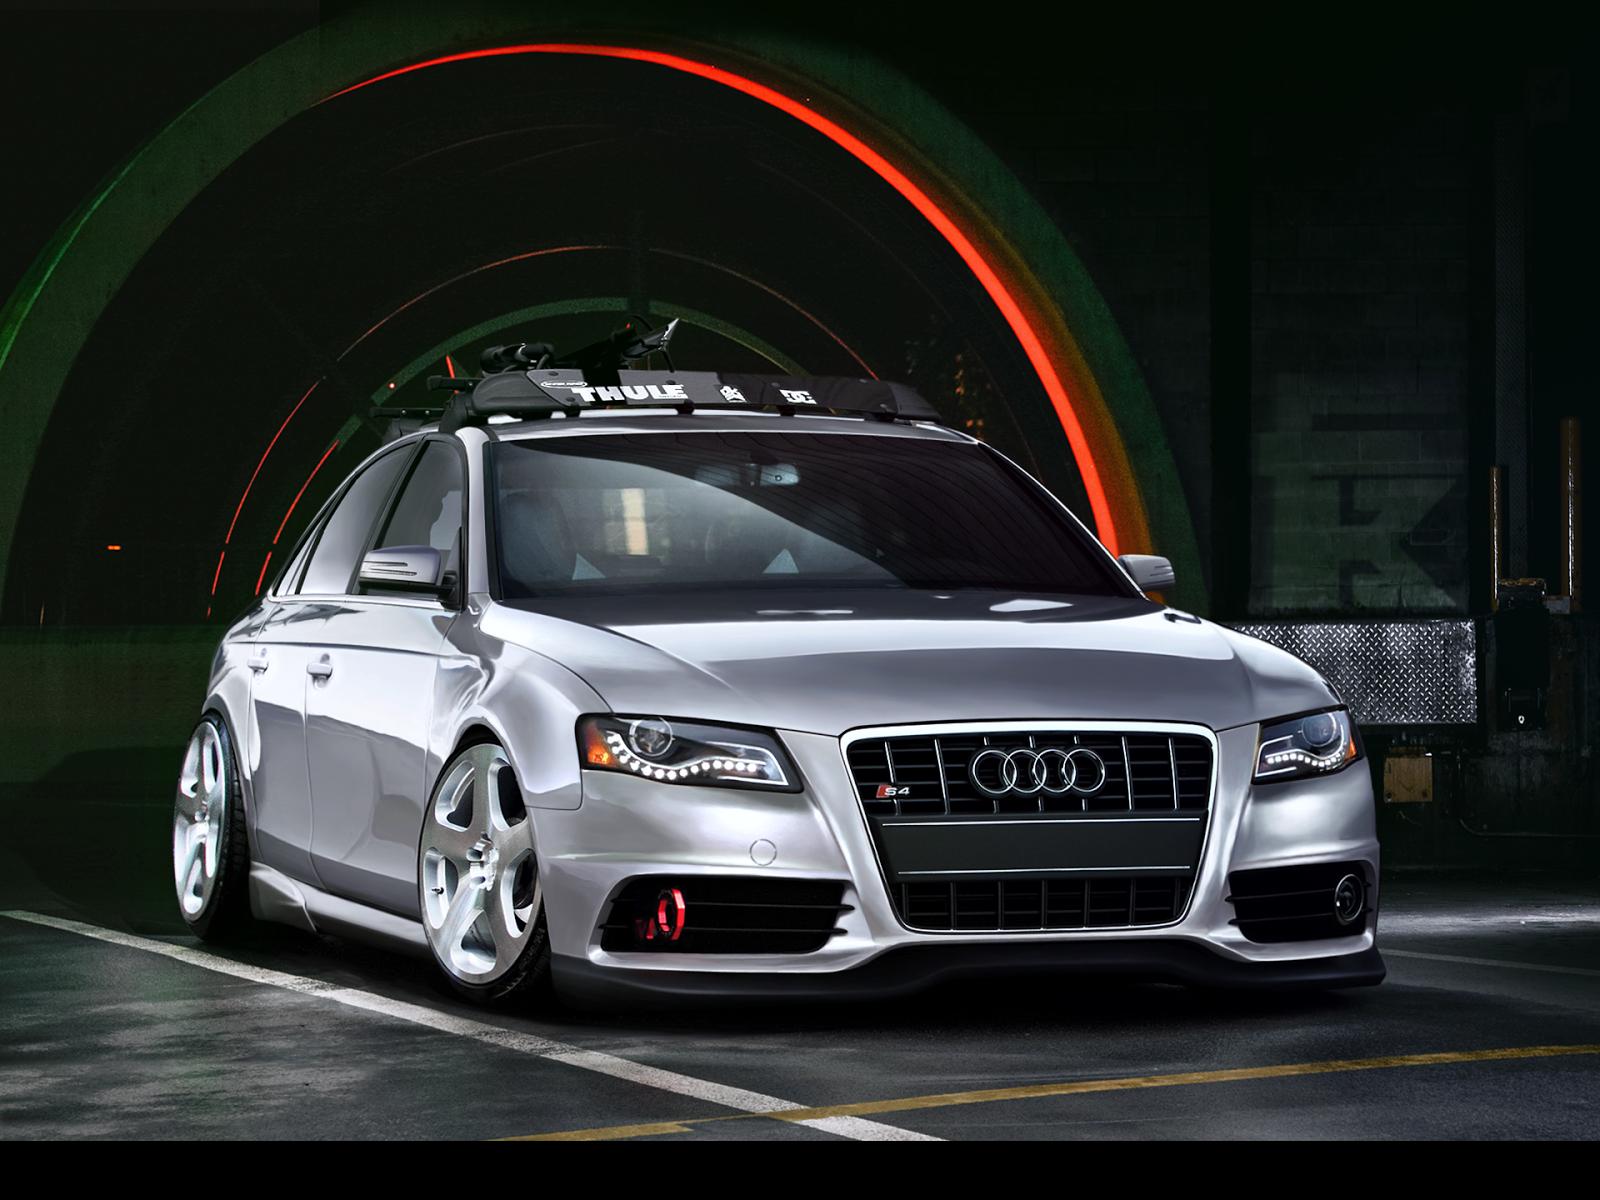 Audi S4 Wallpaper Wallpaper Mansion 1600x1200